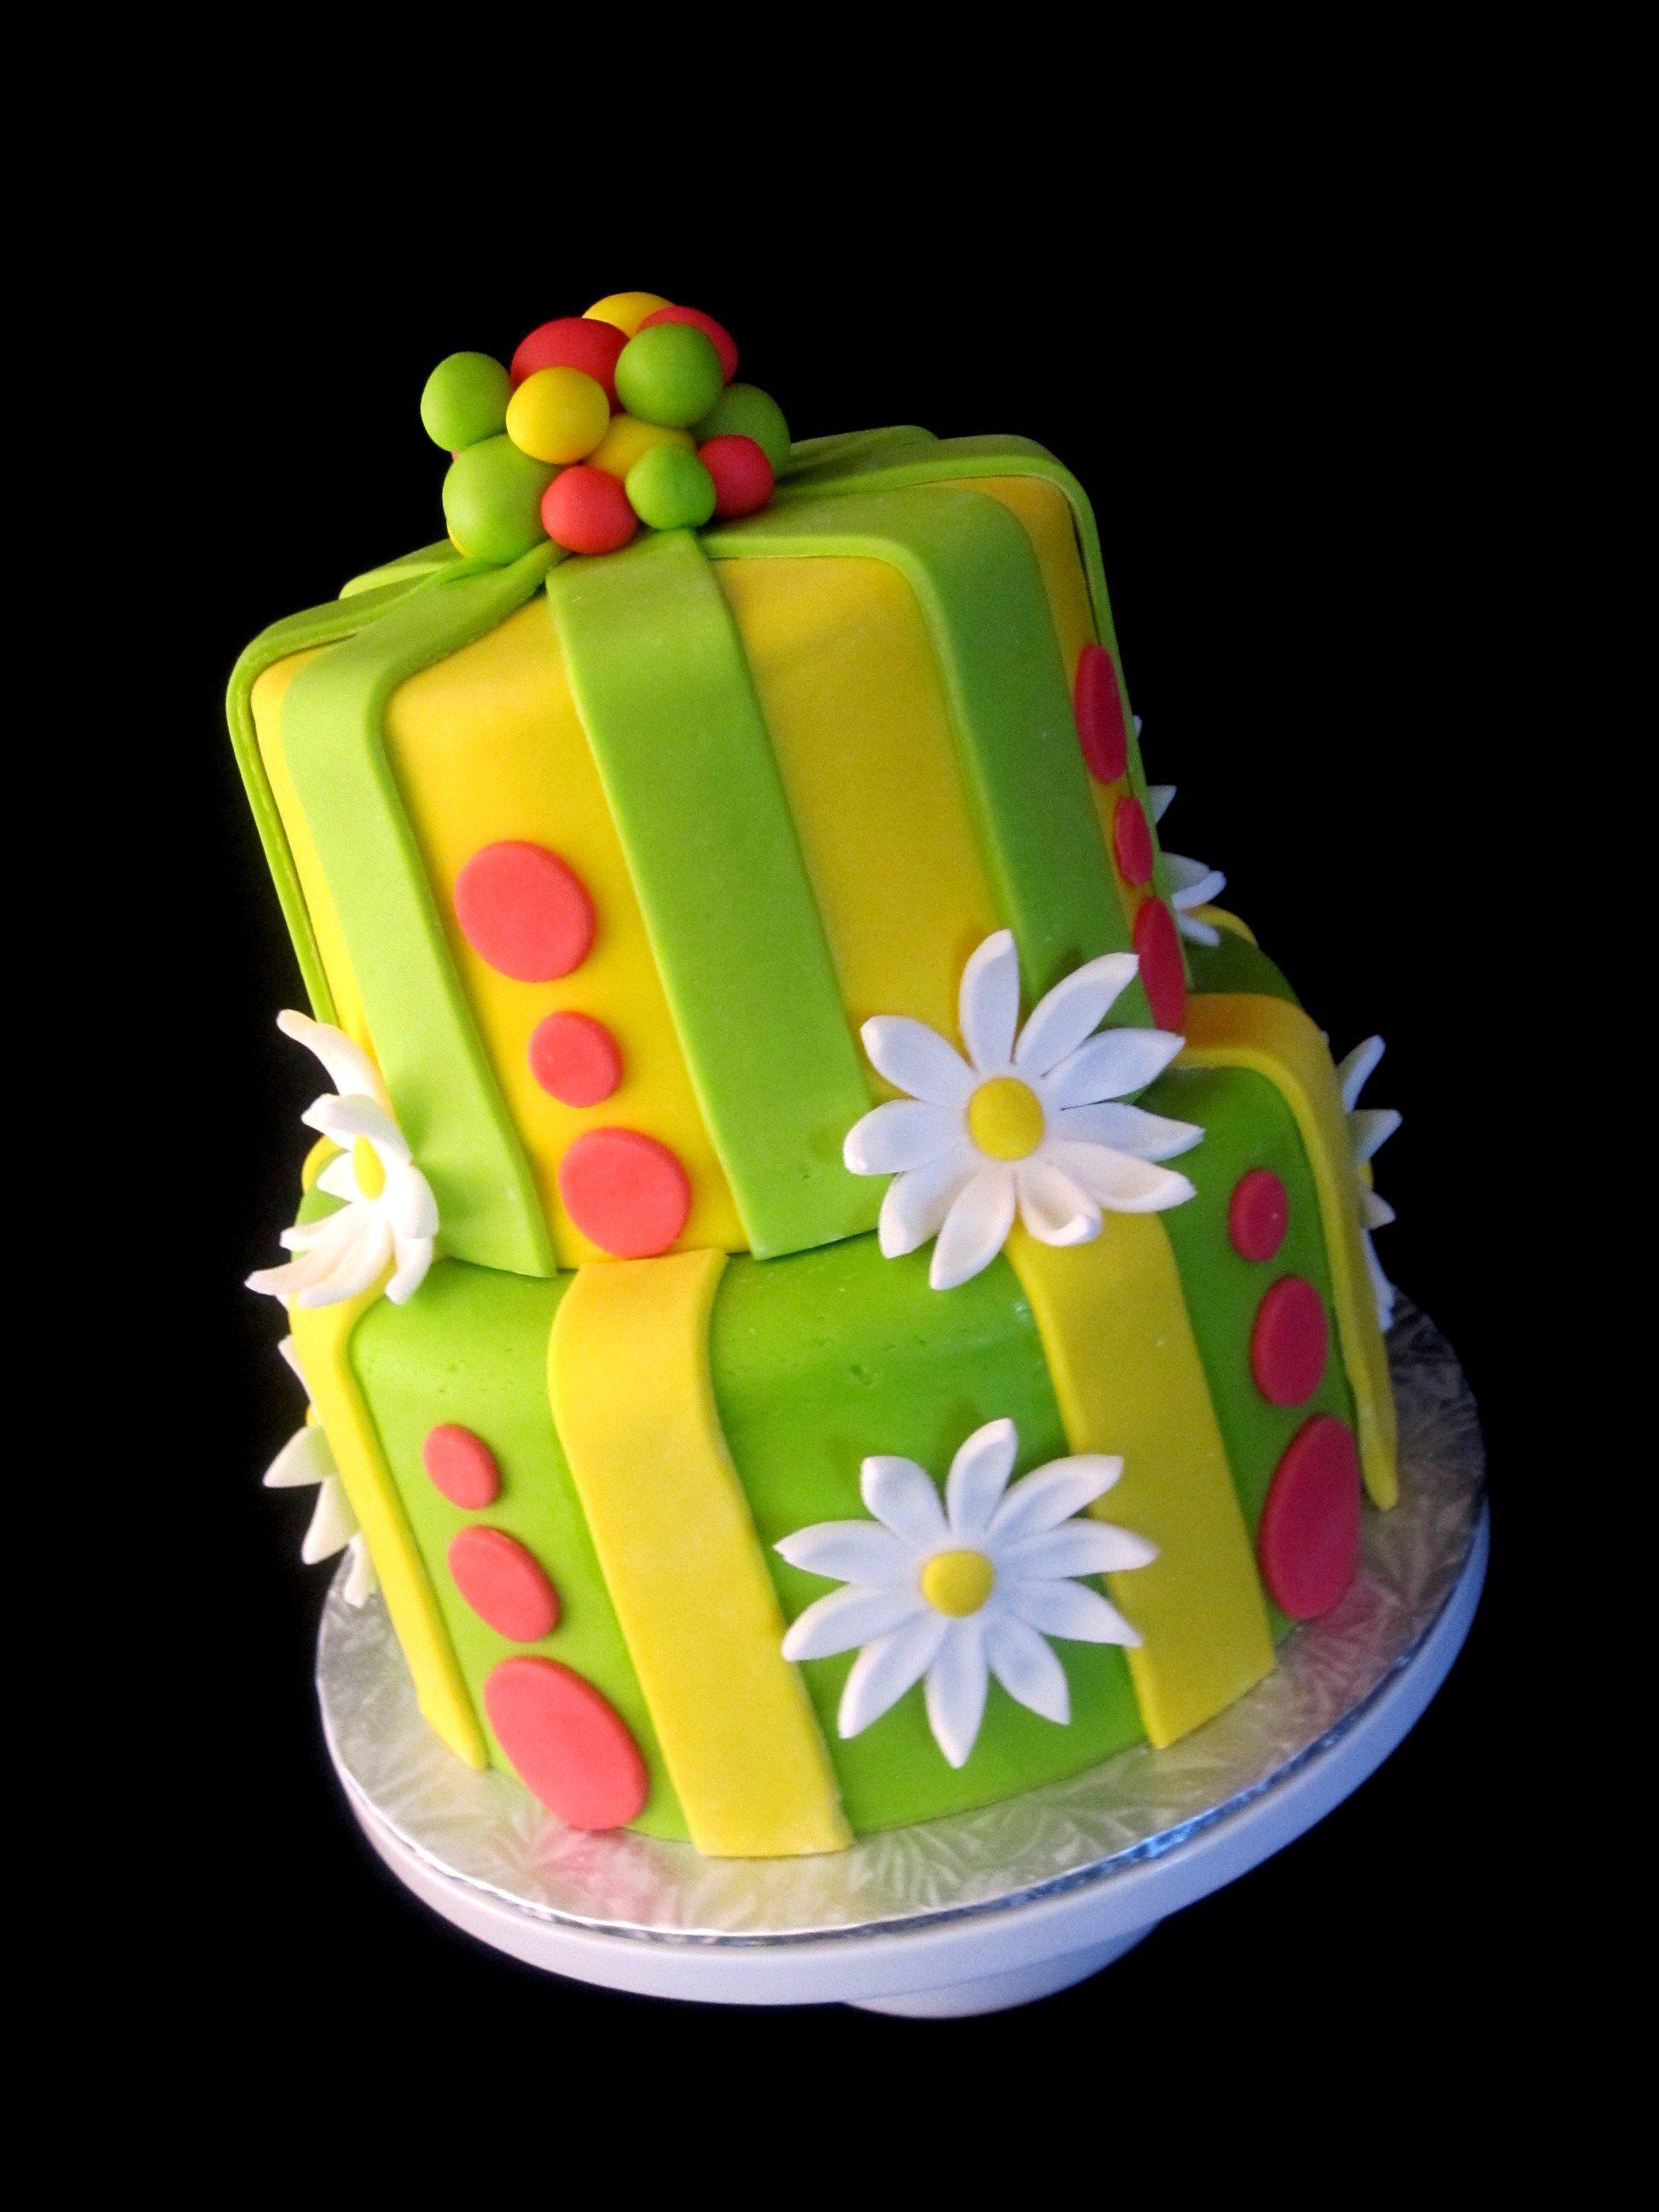 Outstanding Penny Sanford Designs Happy Yellow Birthday Cake Funny Birthday Cards Online Ioscodamsfinfo